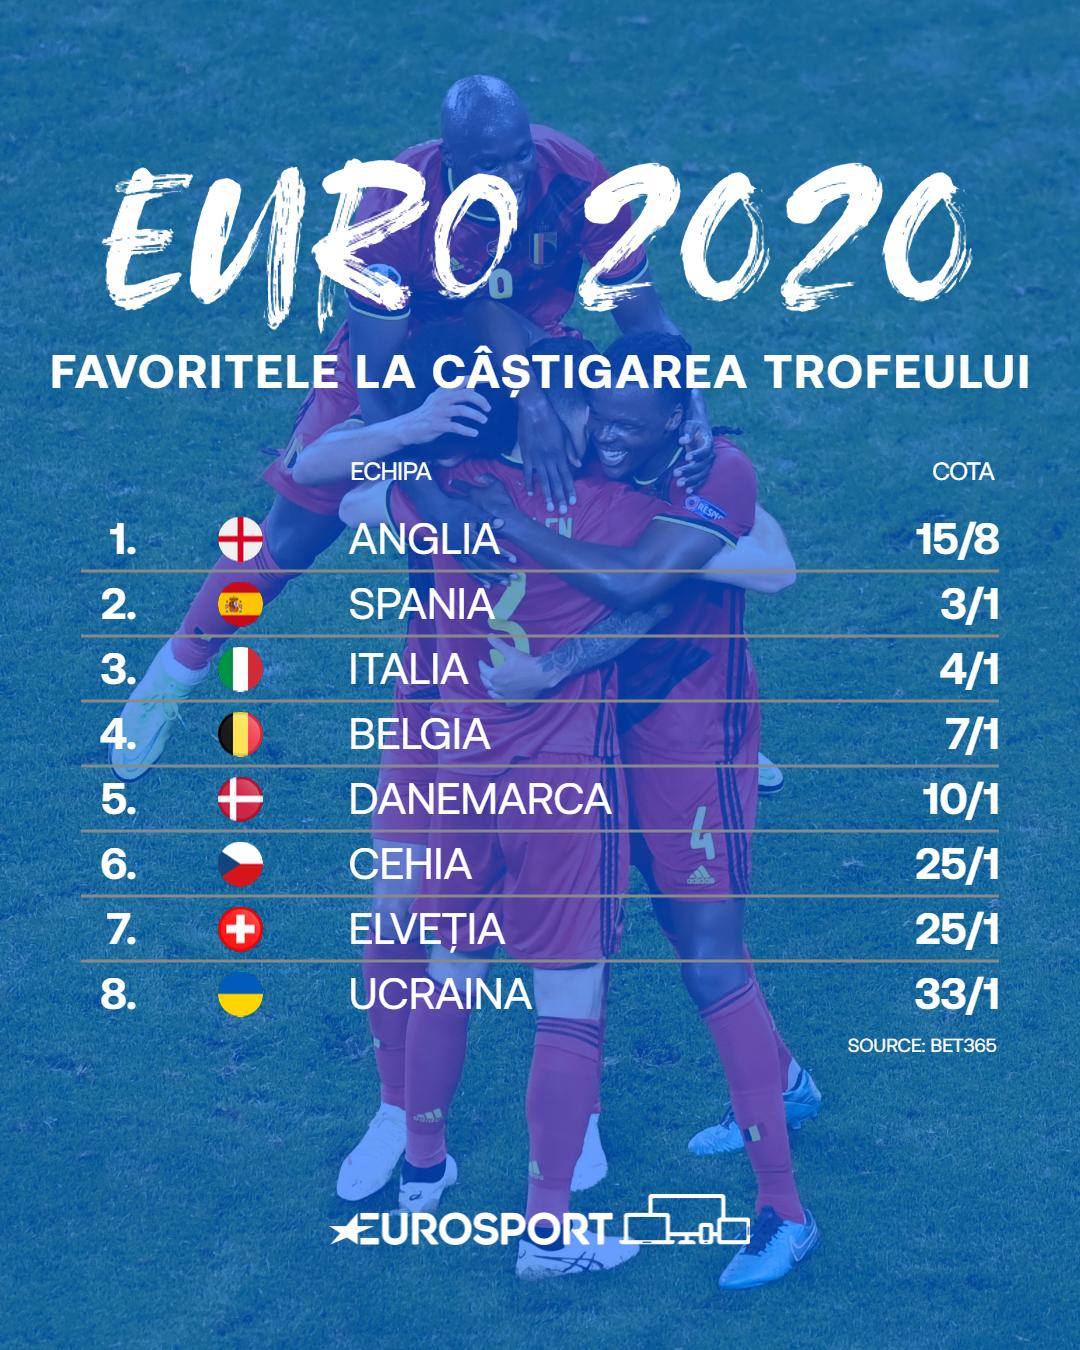 https://i.eurosport.com/2021/07/01/3164986.png